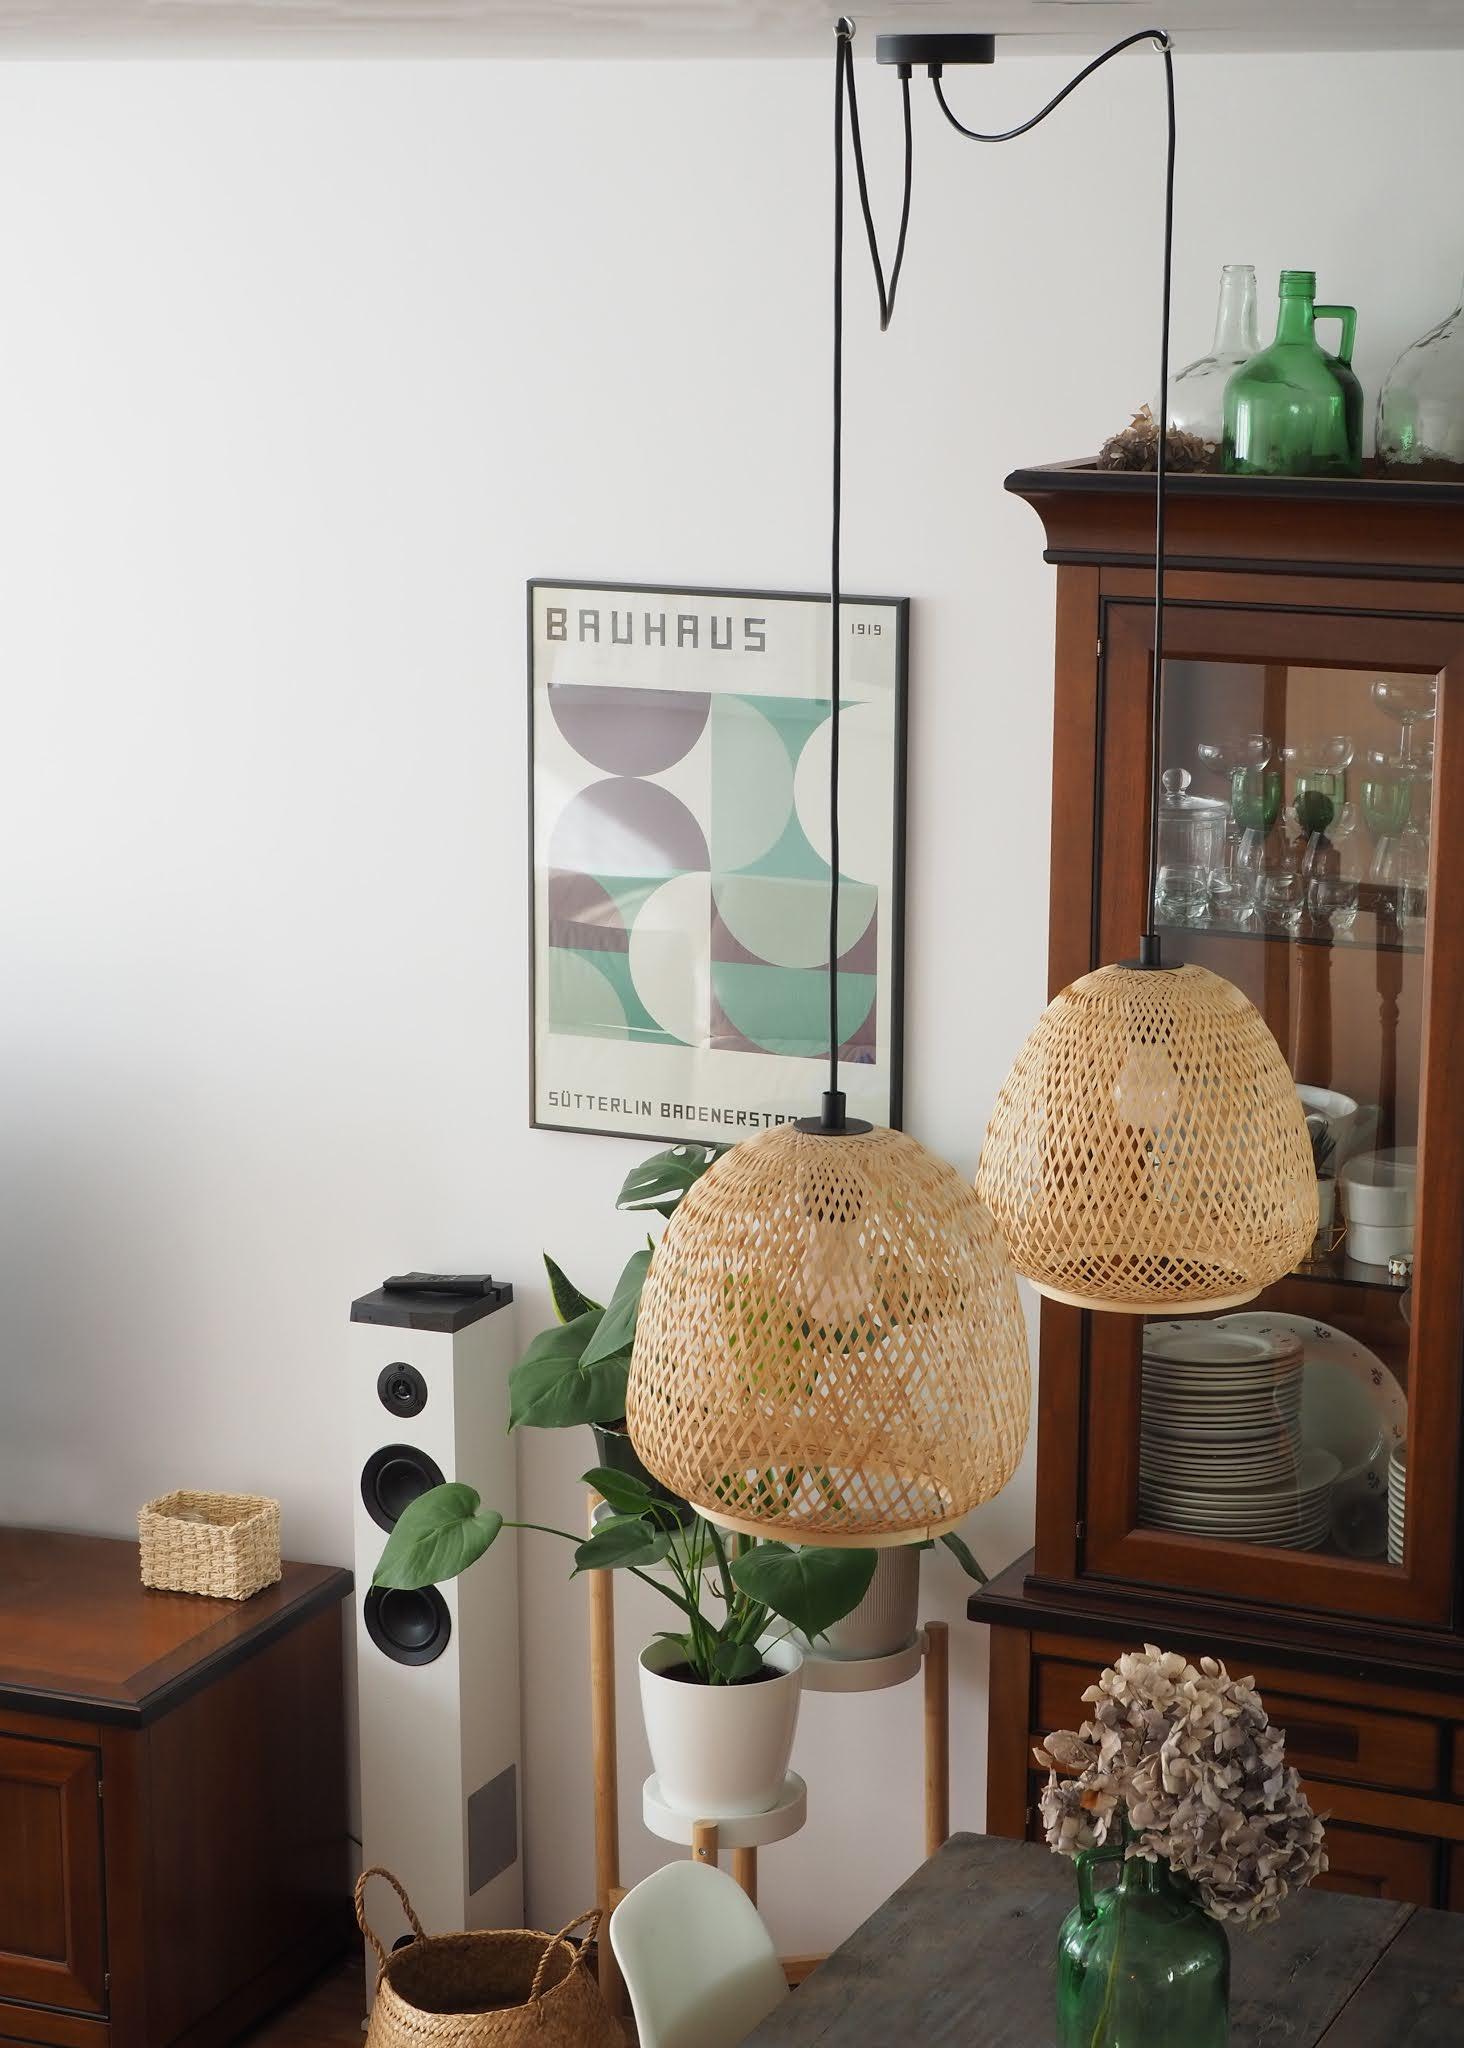 4 trucos para decorar de forma coherente vuestro hogar_13